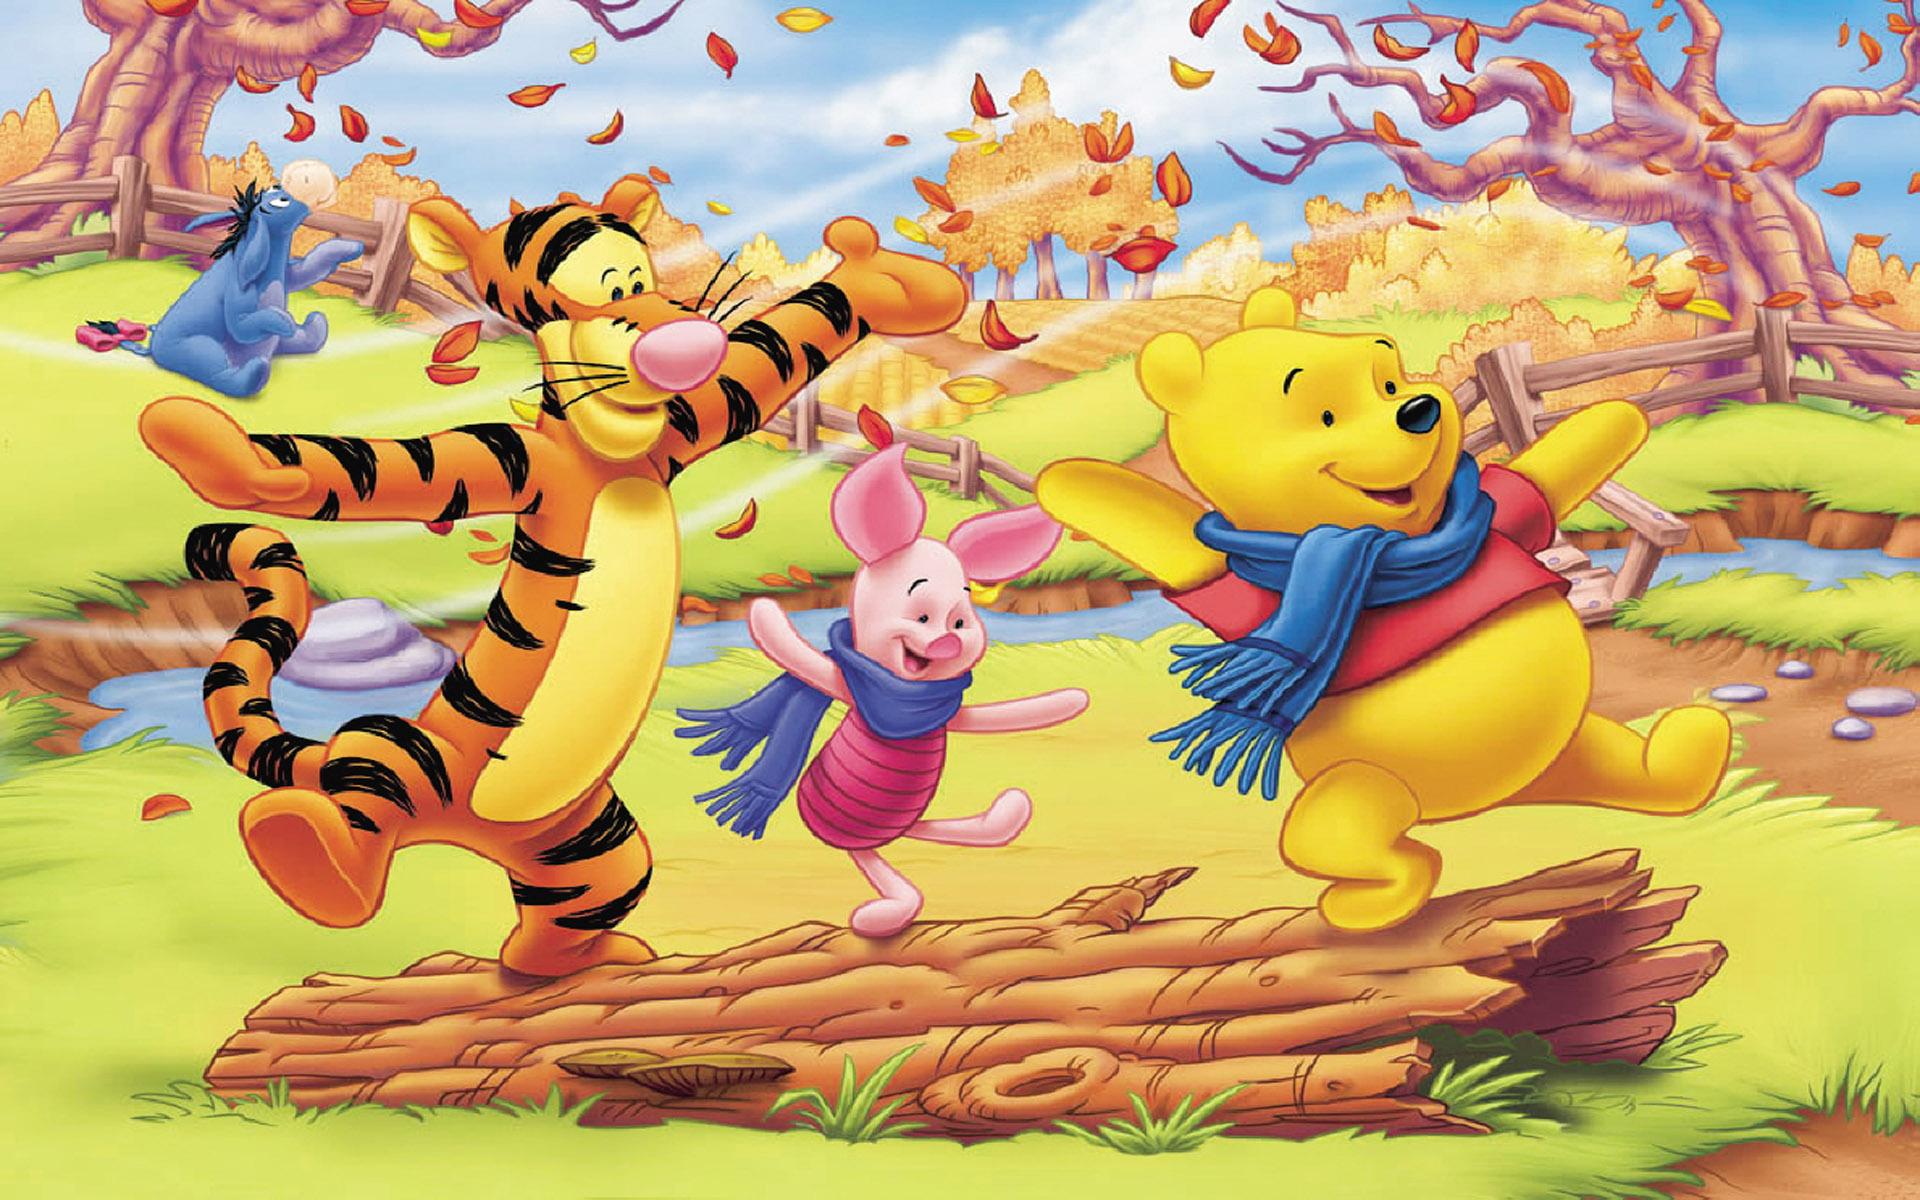 Fall Autumn Desktop Wallpaper Winnie The Pooh And Friends Autumn Pictures Cartoon Hd